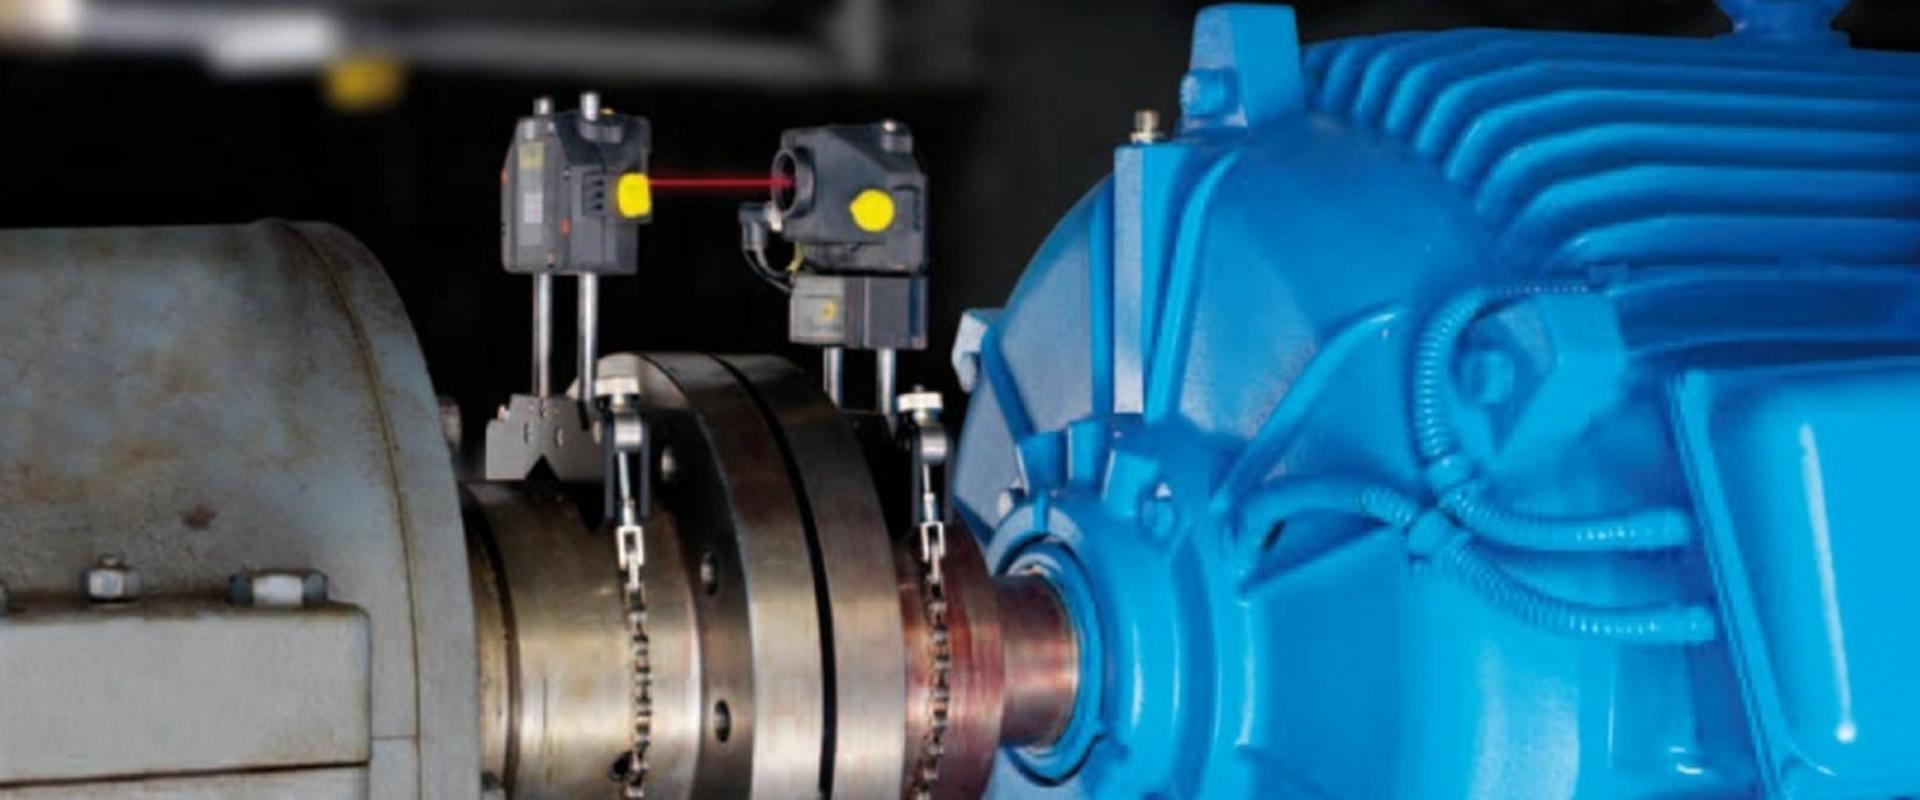 Laser Shaft Alignment | Laser Alignment Services - LER Ltd